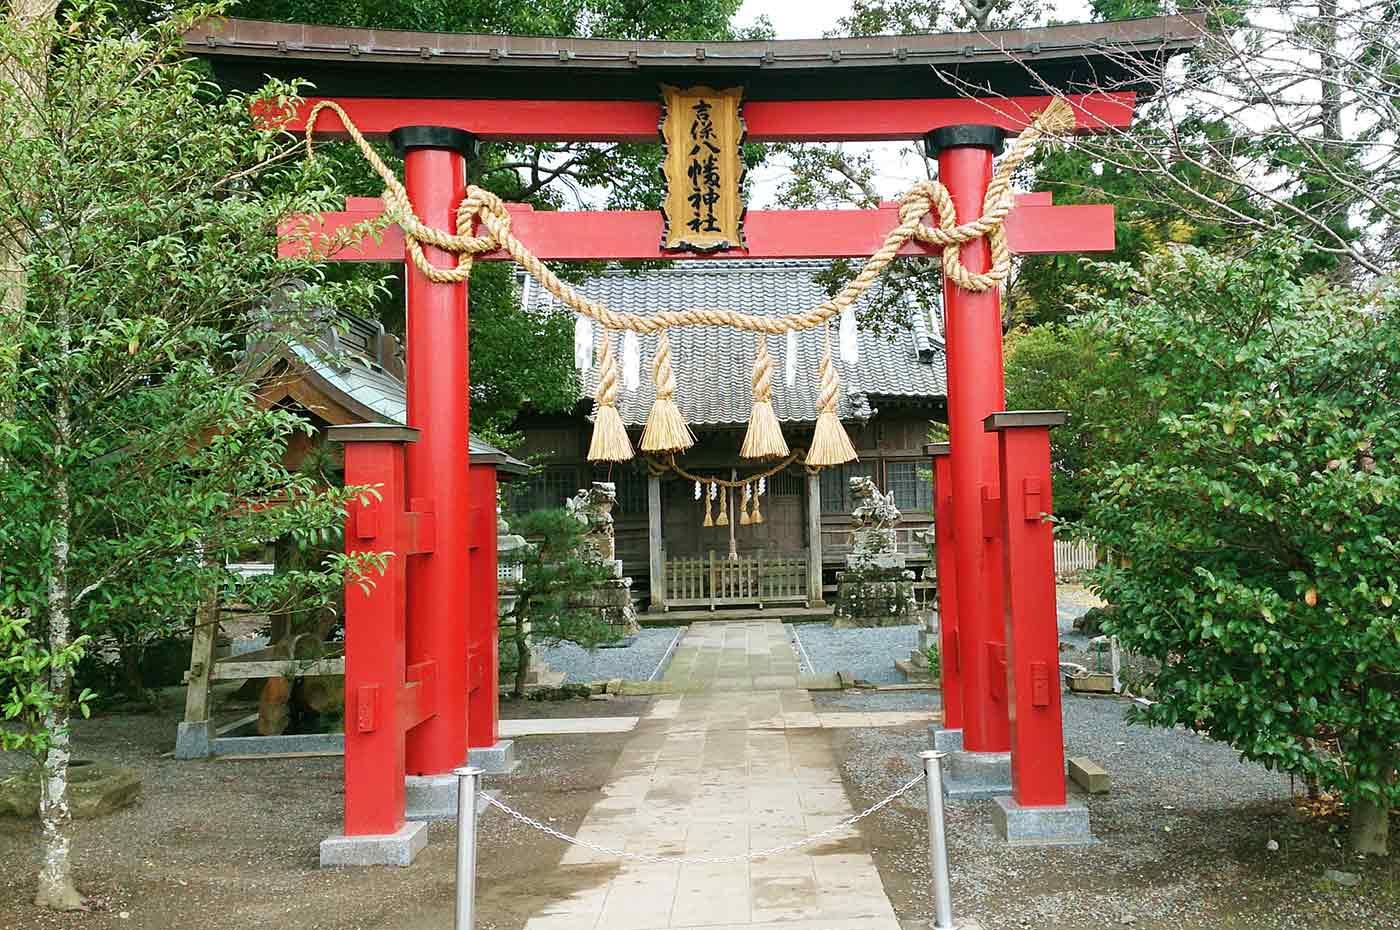 吉保八幡神社の鳥居